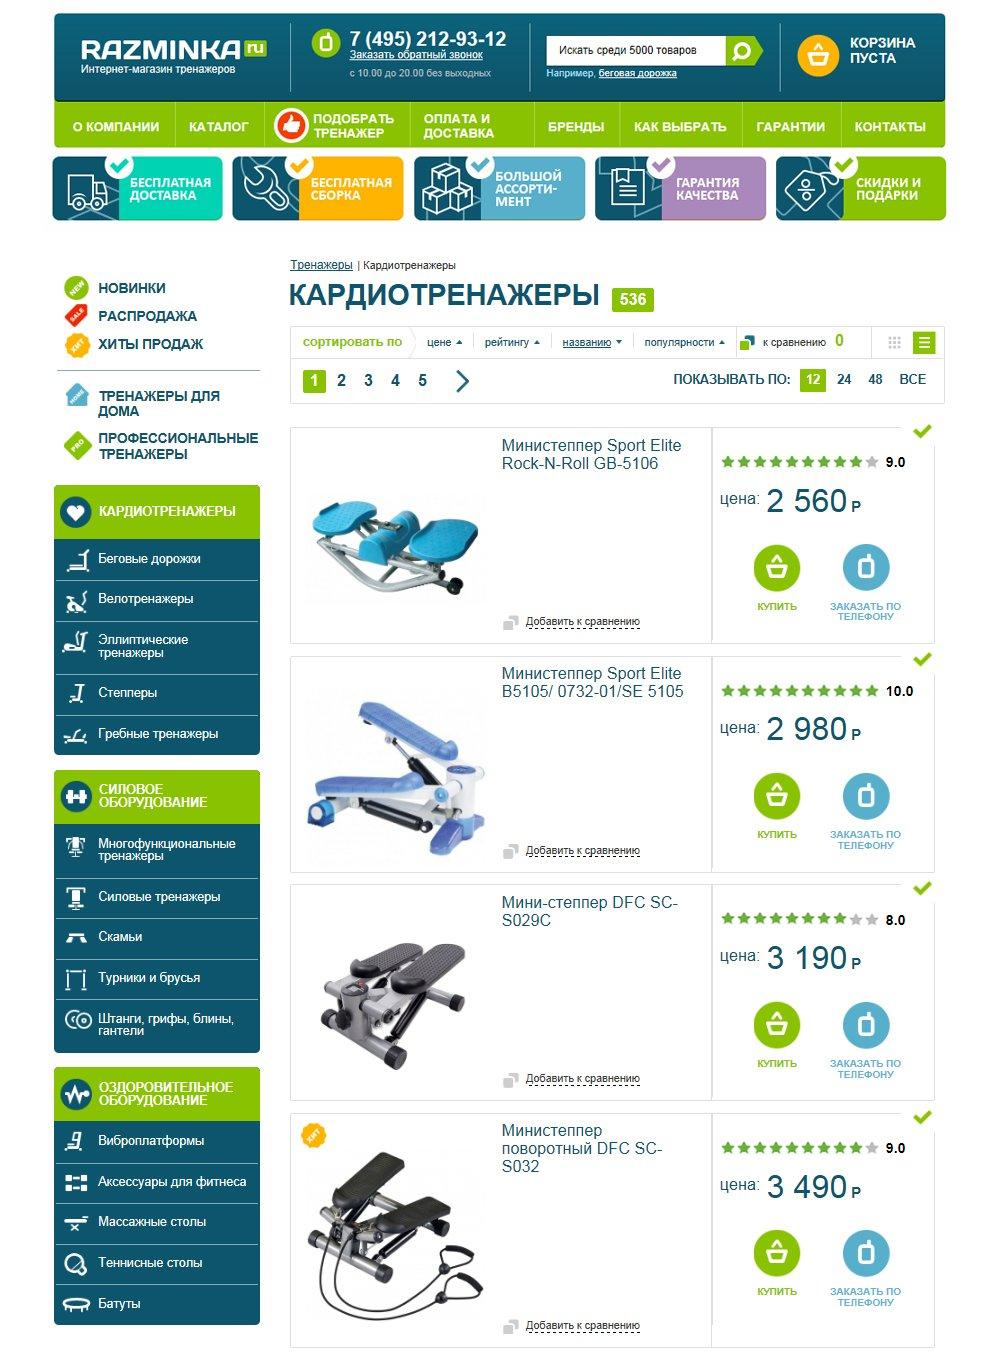 Каталог товаров на сайте интернет-магазина тренажеров Razminka.ru